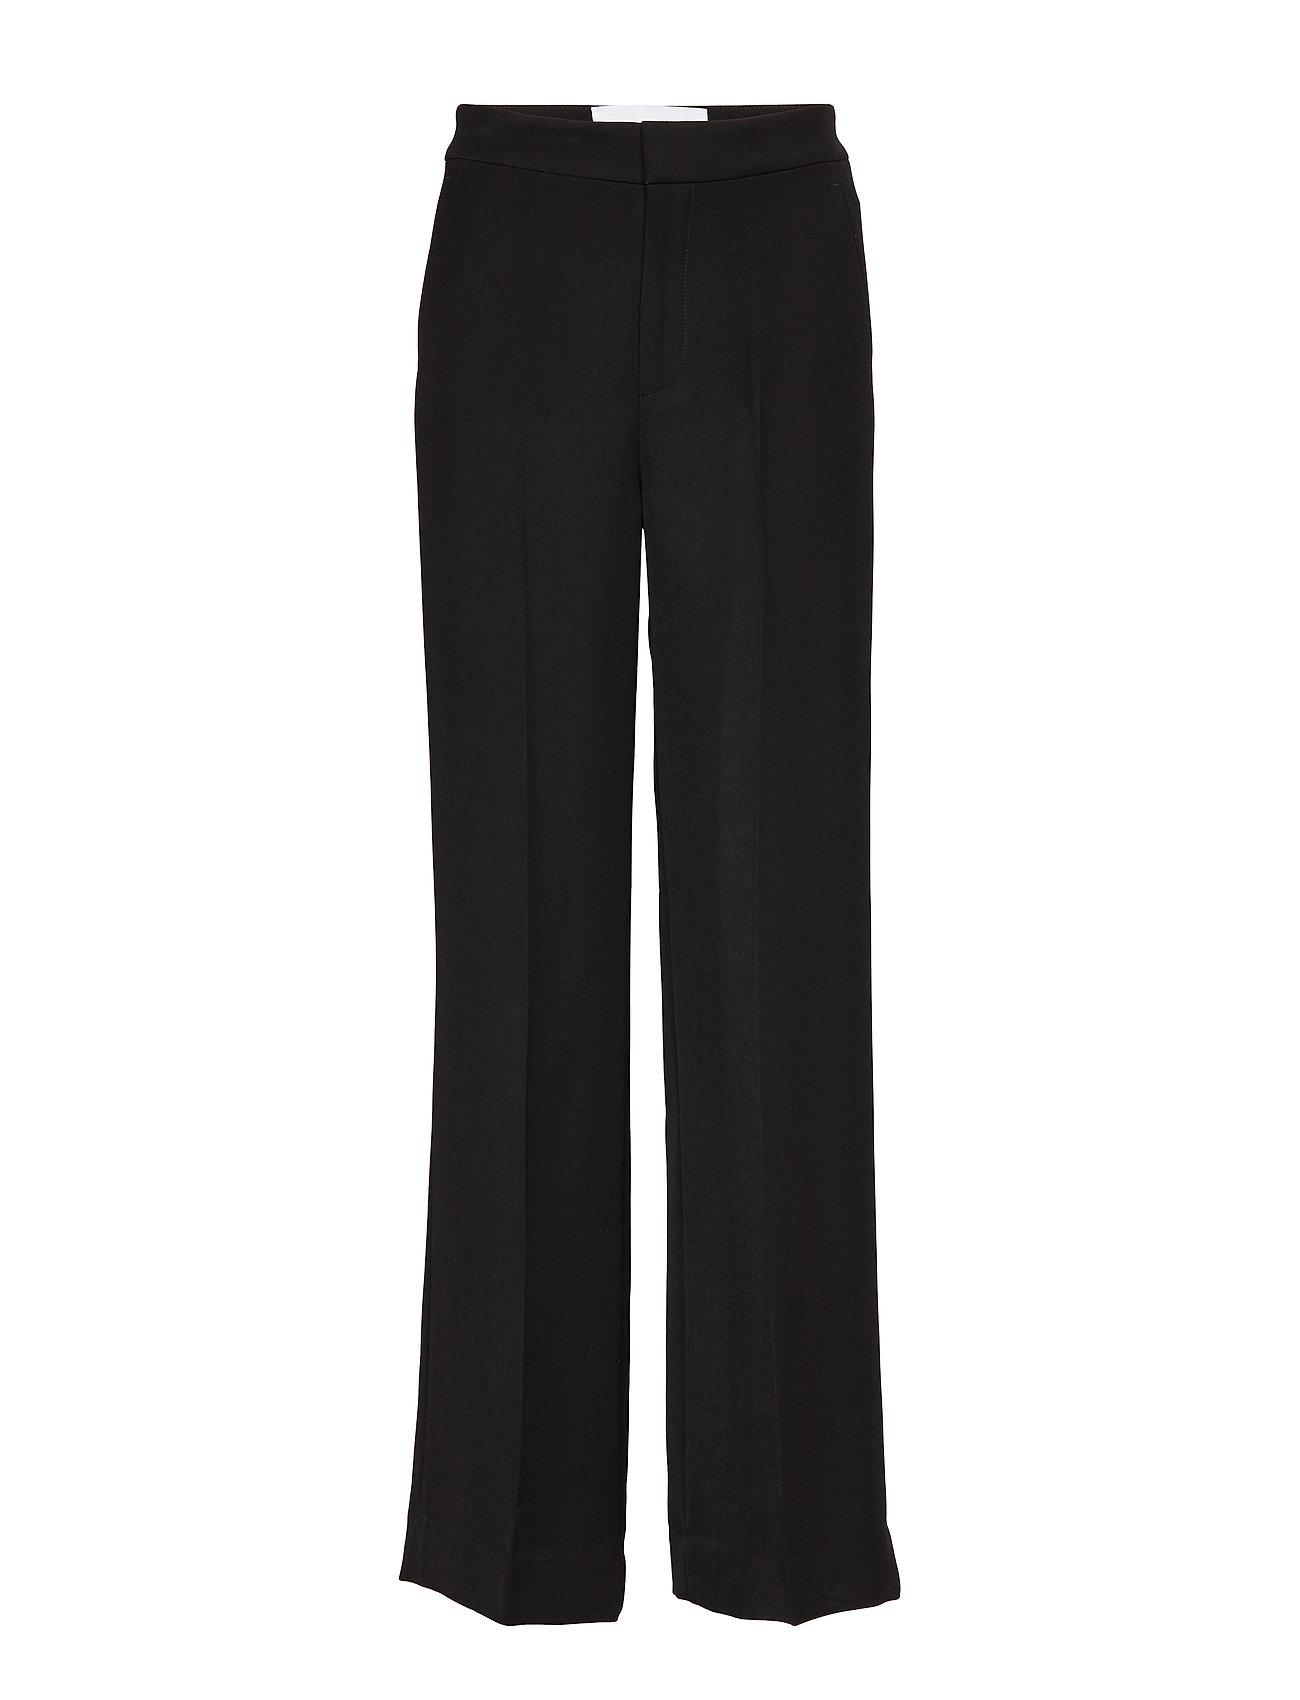 Image of Unique Trouser Vide Bukser Sort Camilla Pihl (3363496137)